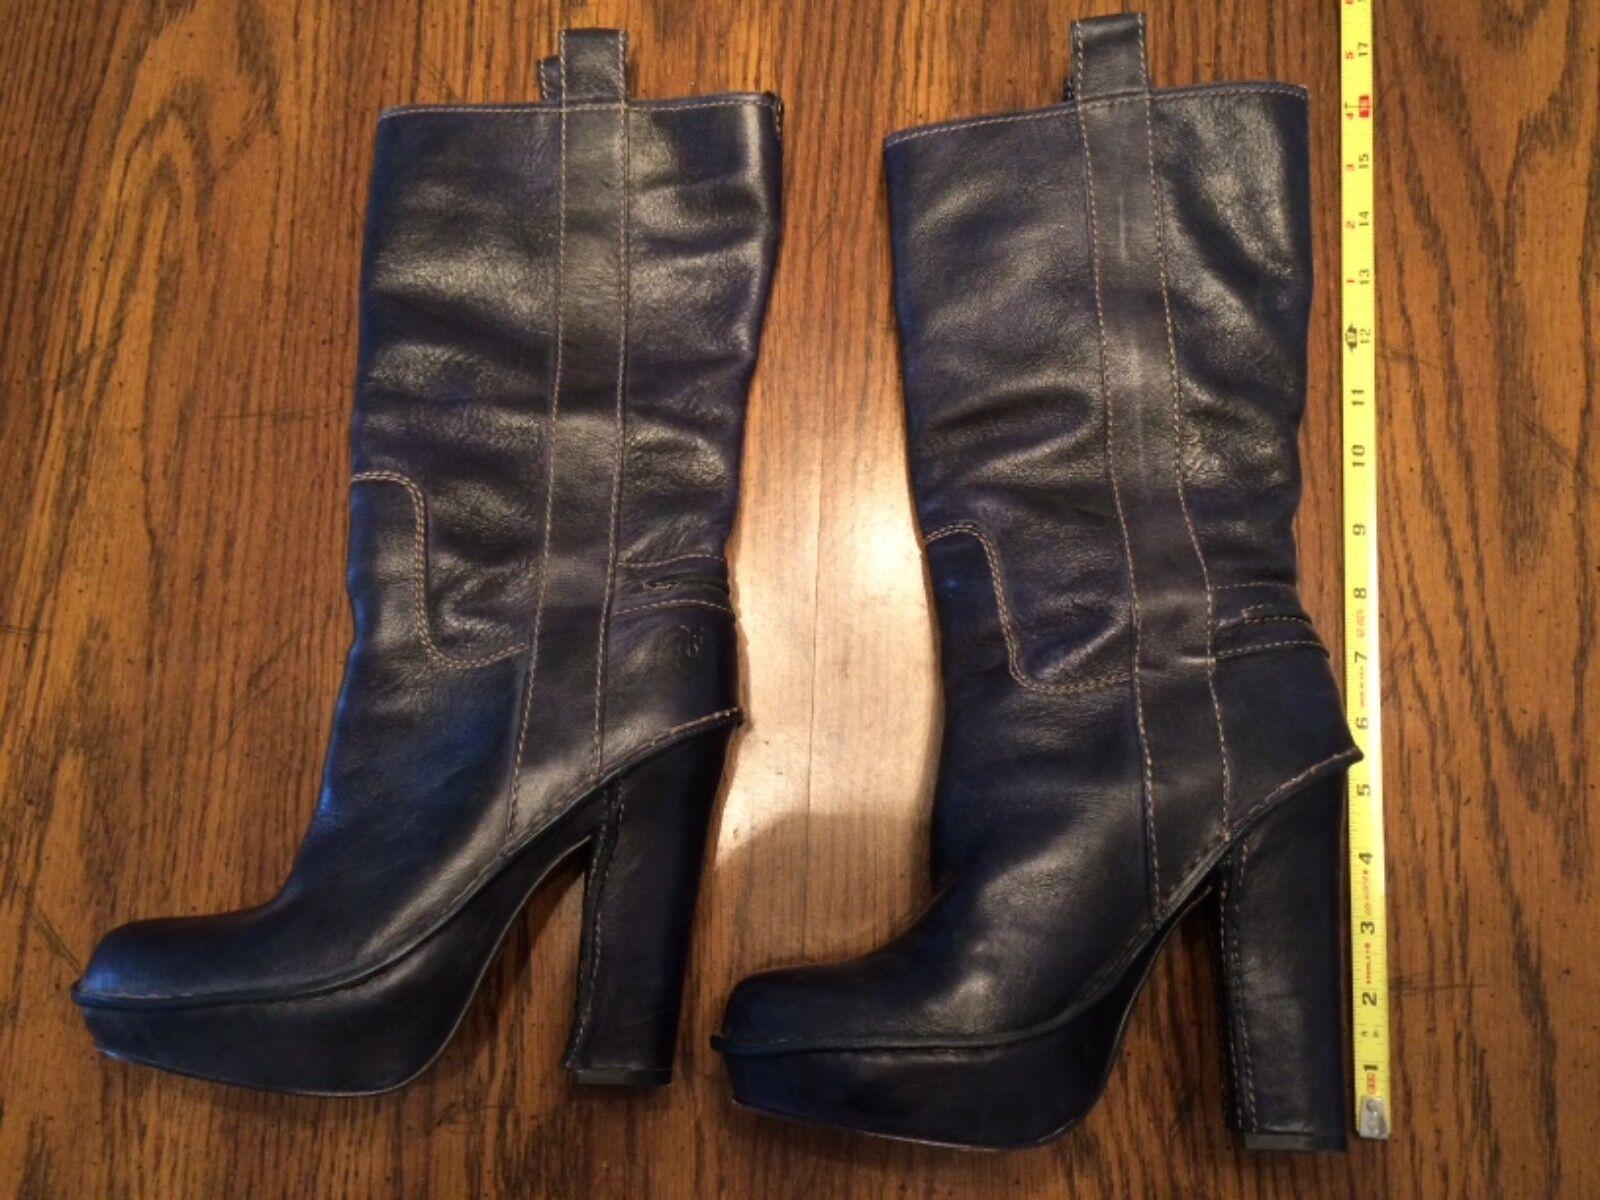 Frye Victoria Mid Leather Platform Block Heel Boot Womens 8.5M dark navy blue